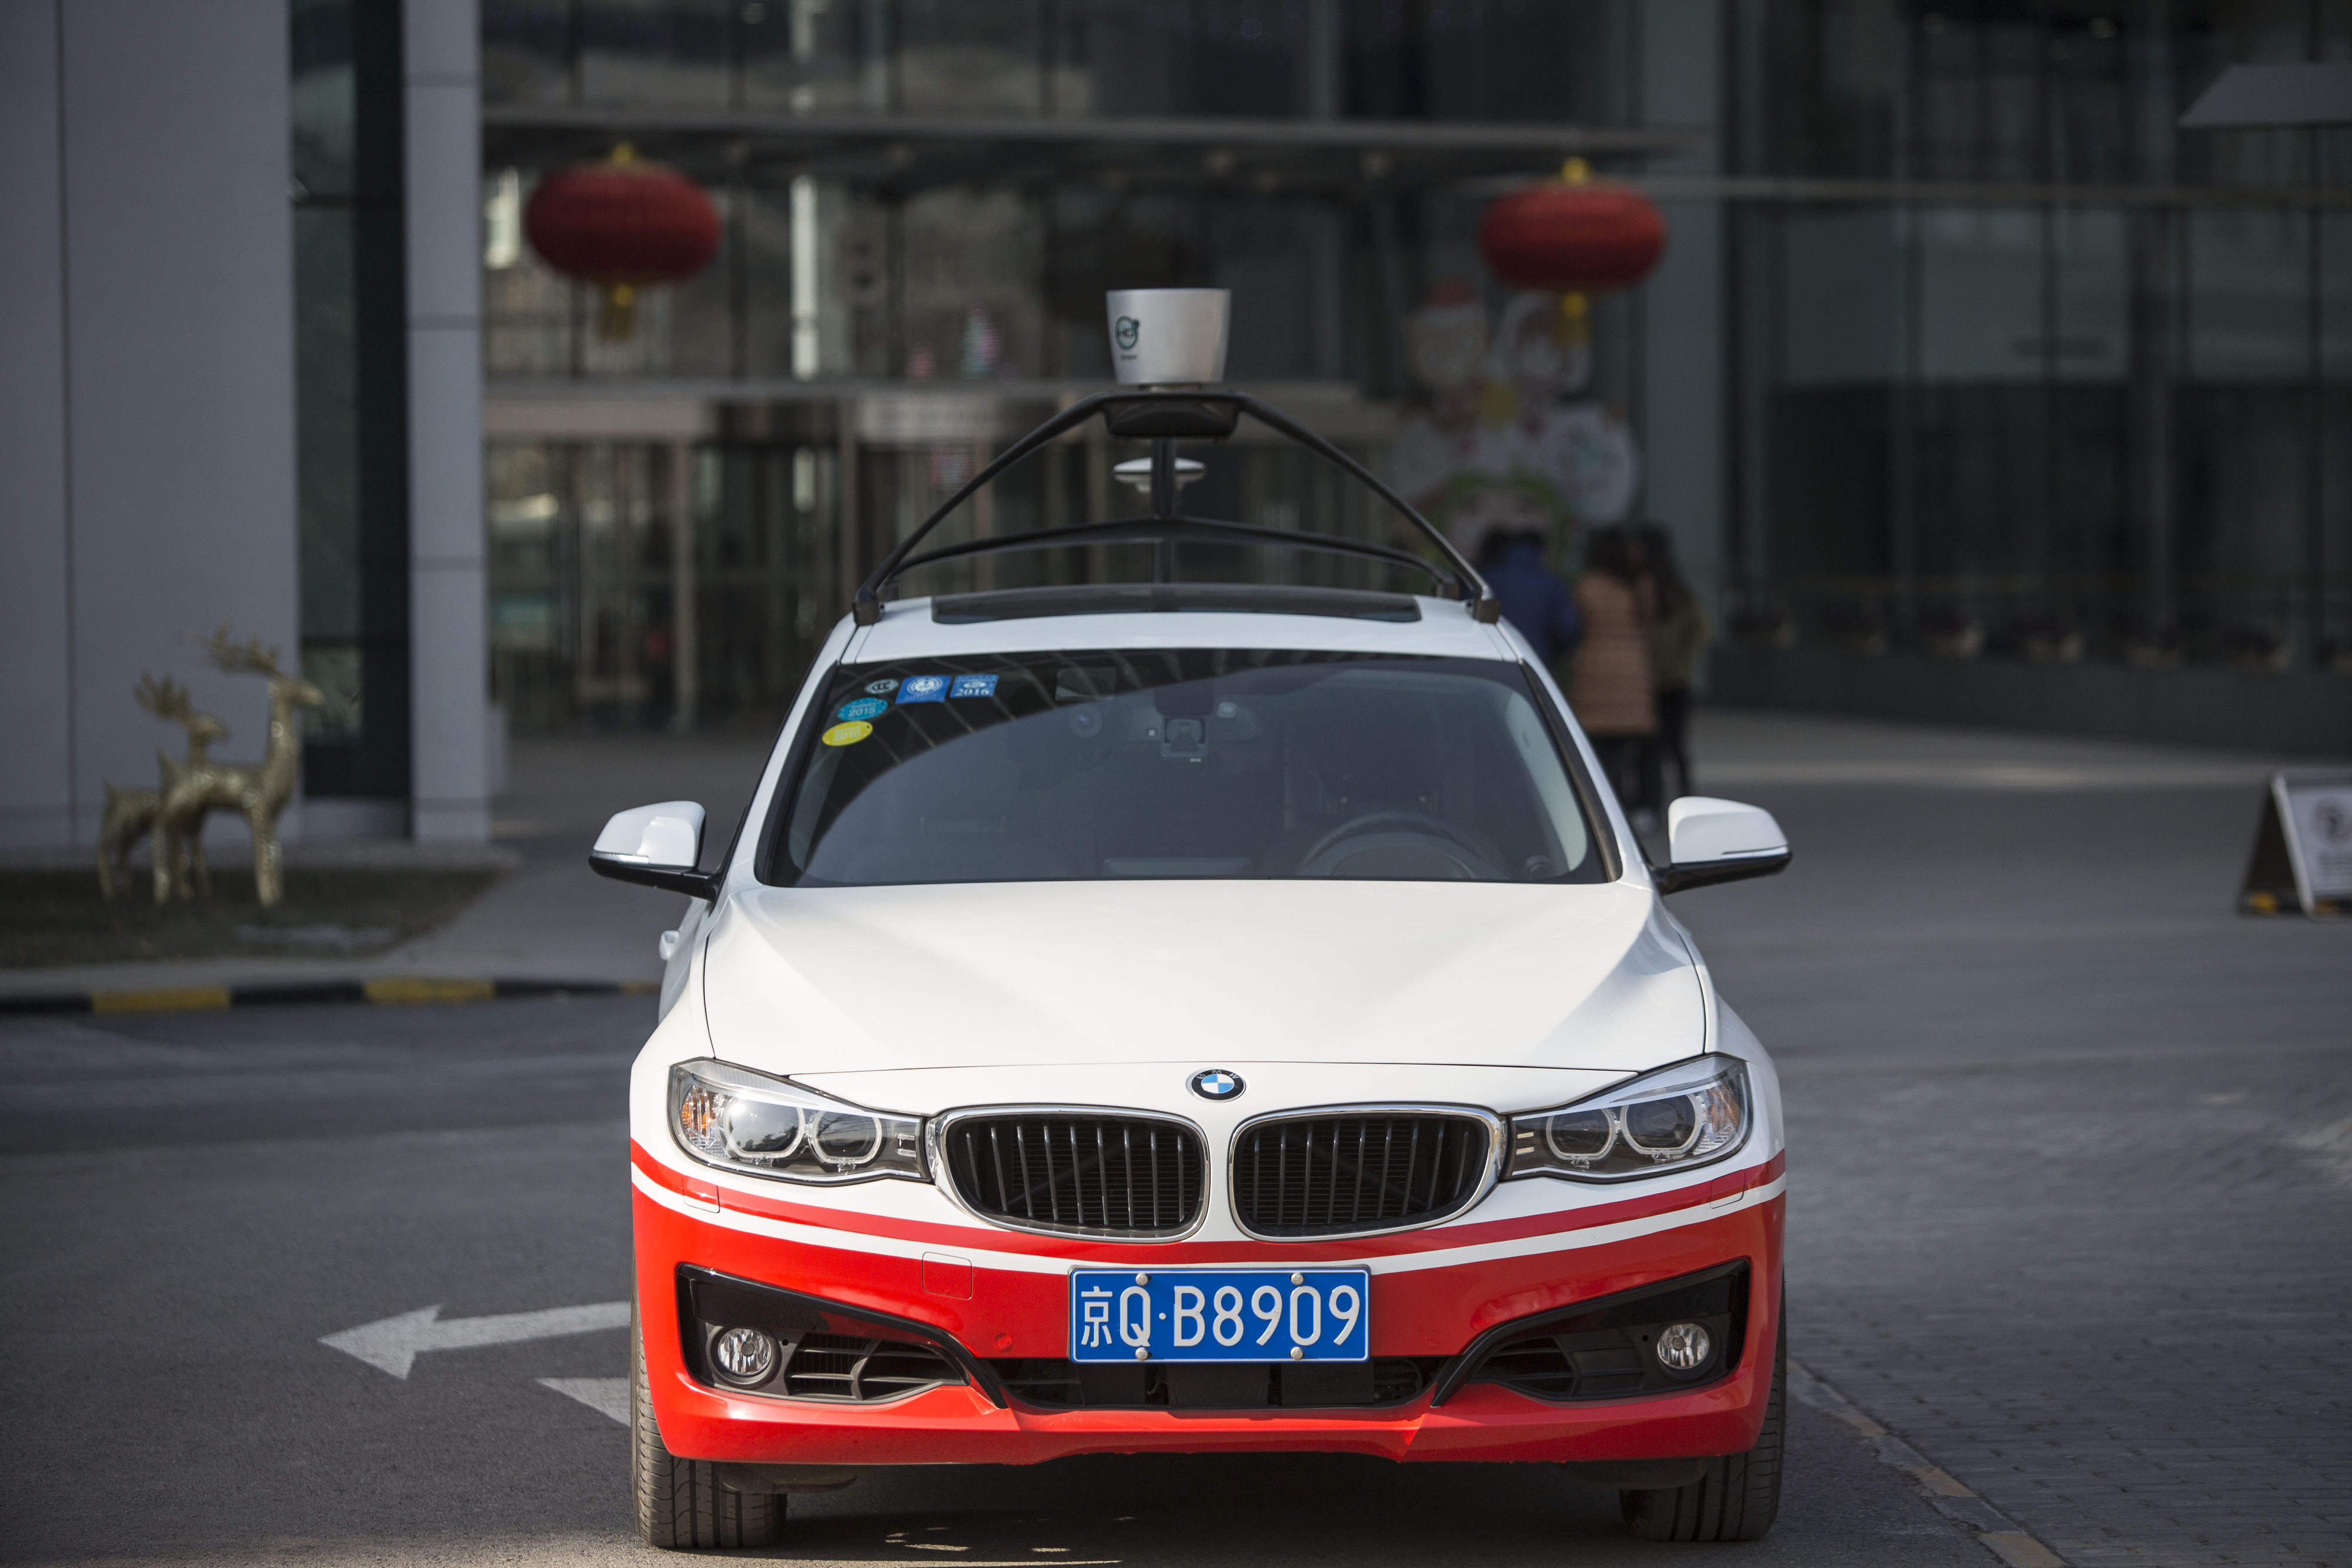 Baidu Inc.'s Autonomous Car Project And Senior Vice President Wang Jing Interview